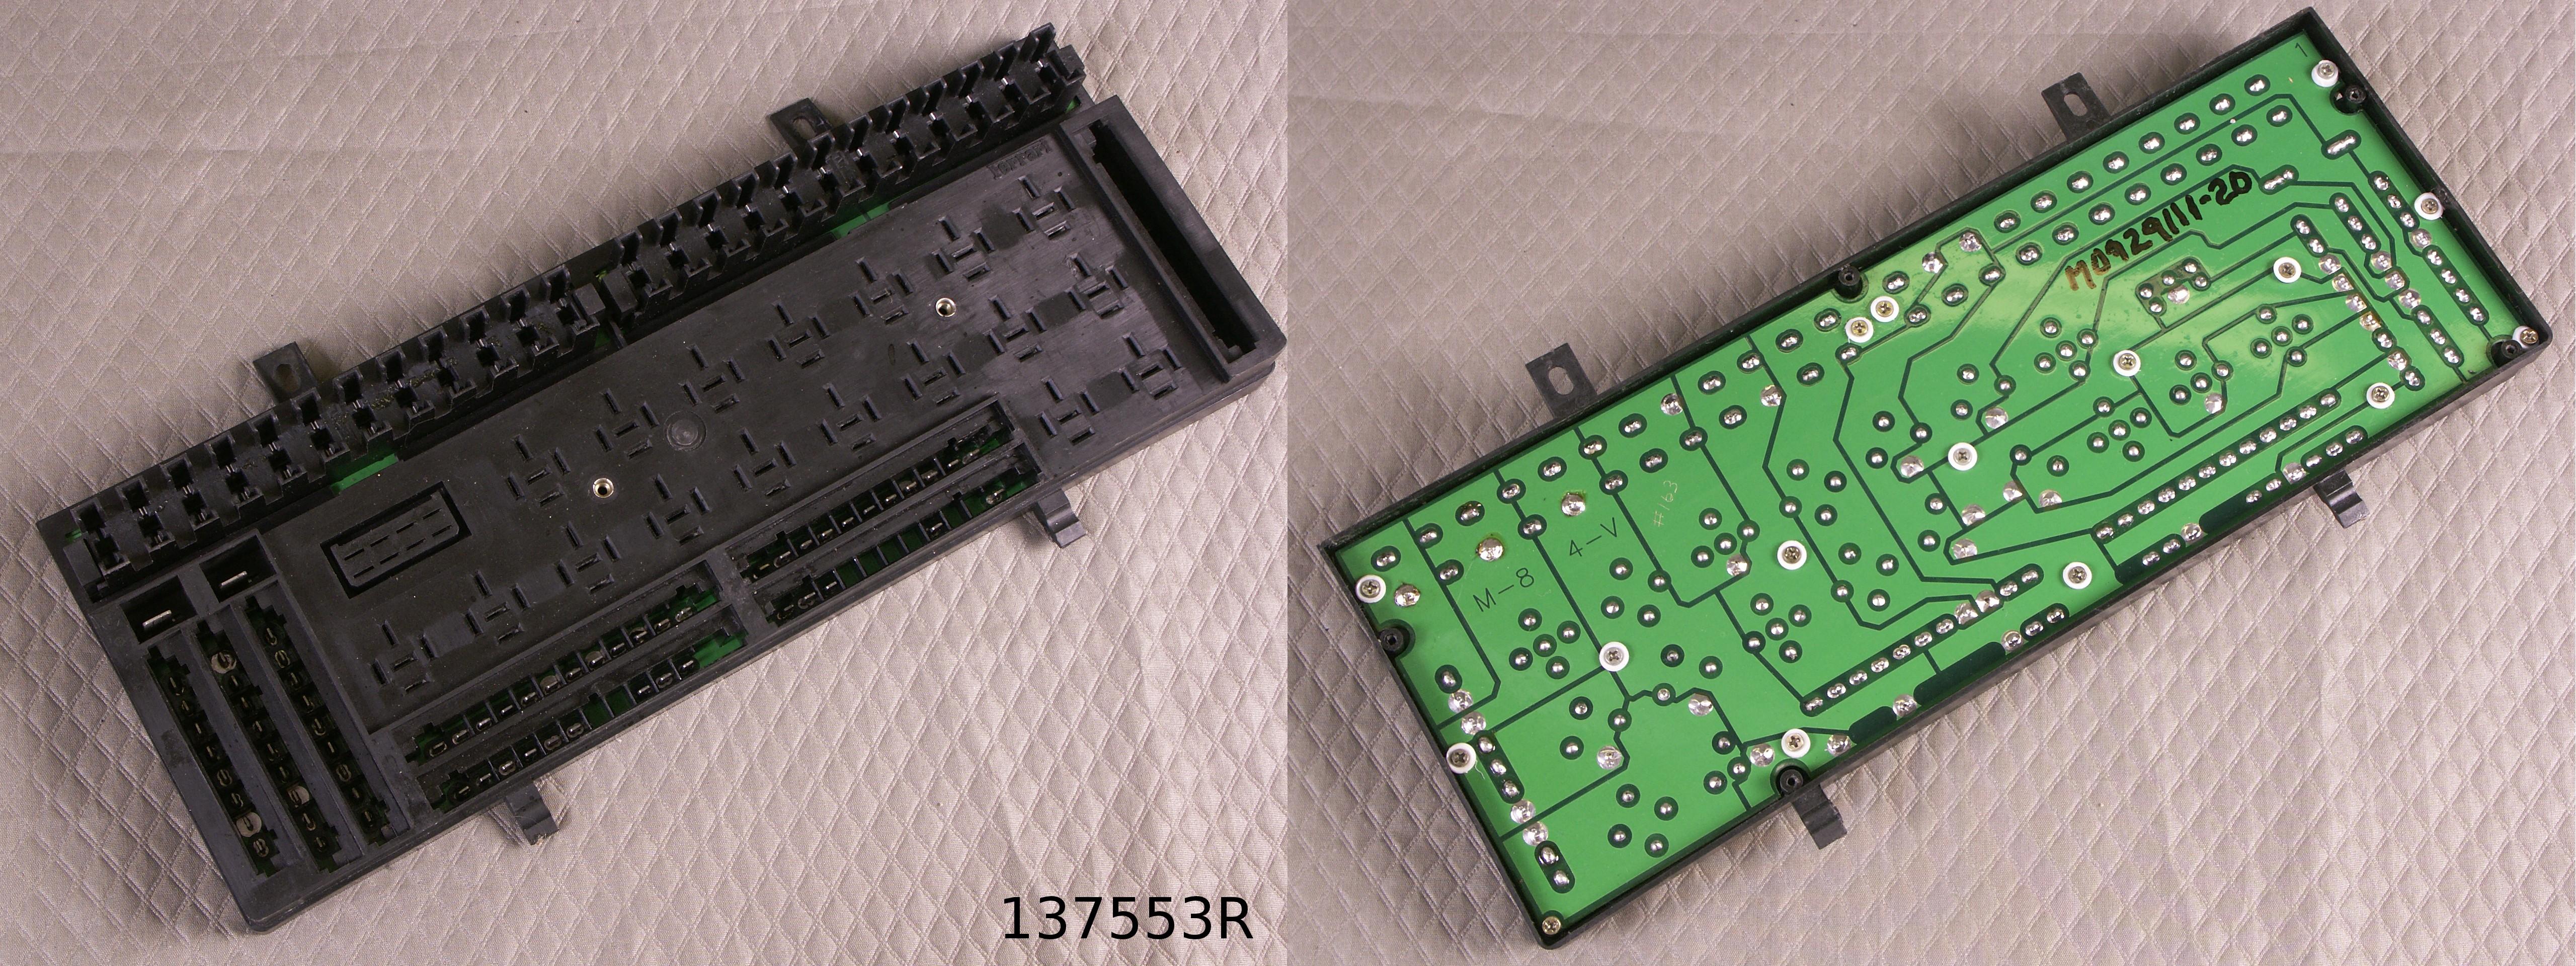 328 mondial remanufactured fuse box g t car parts inc. Black Bedroom Furniture Sets. Home Design Ideas